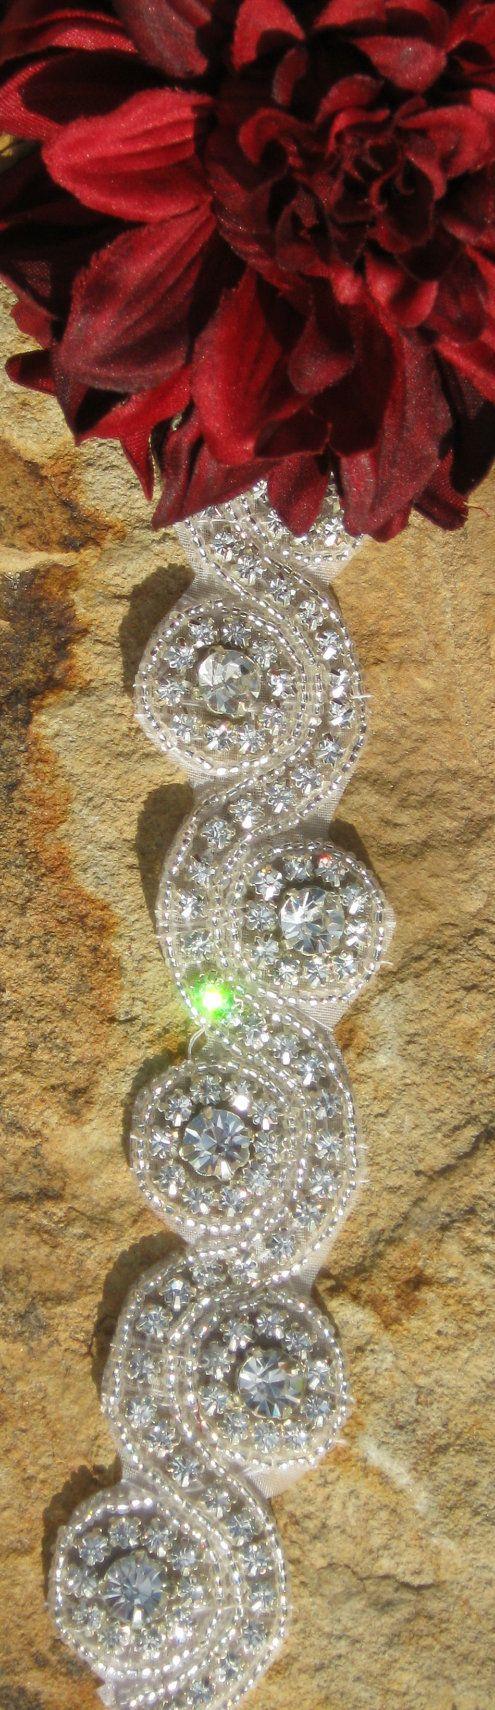 DIY Bridal Sash Beautiful Hand Beaded by CoutureEmbellishment, $15.99